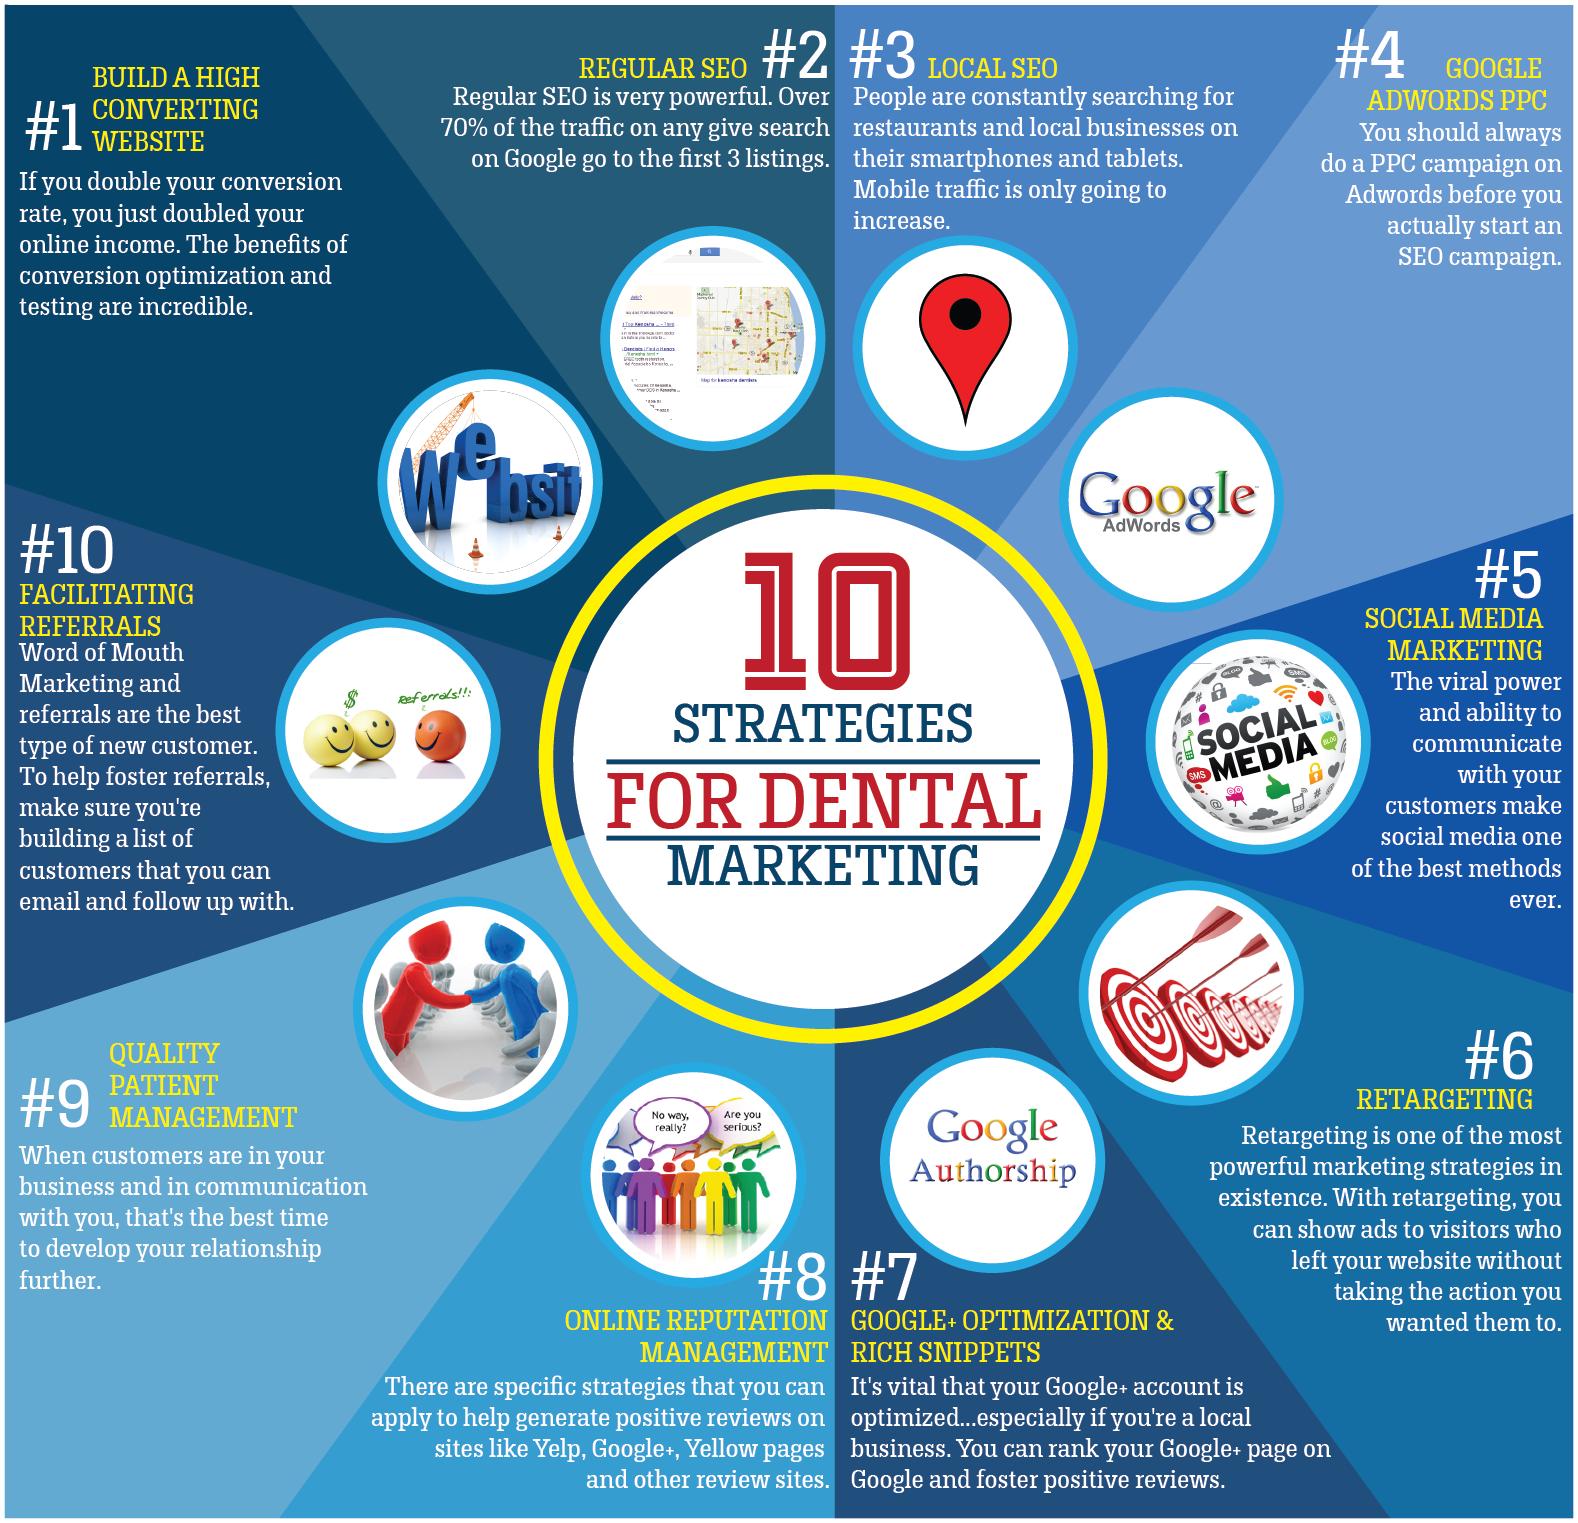 10 Strategies For Dental Marketing